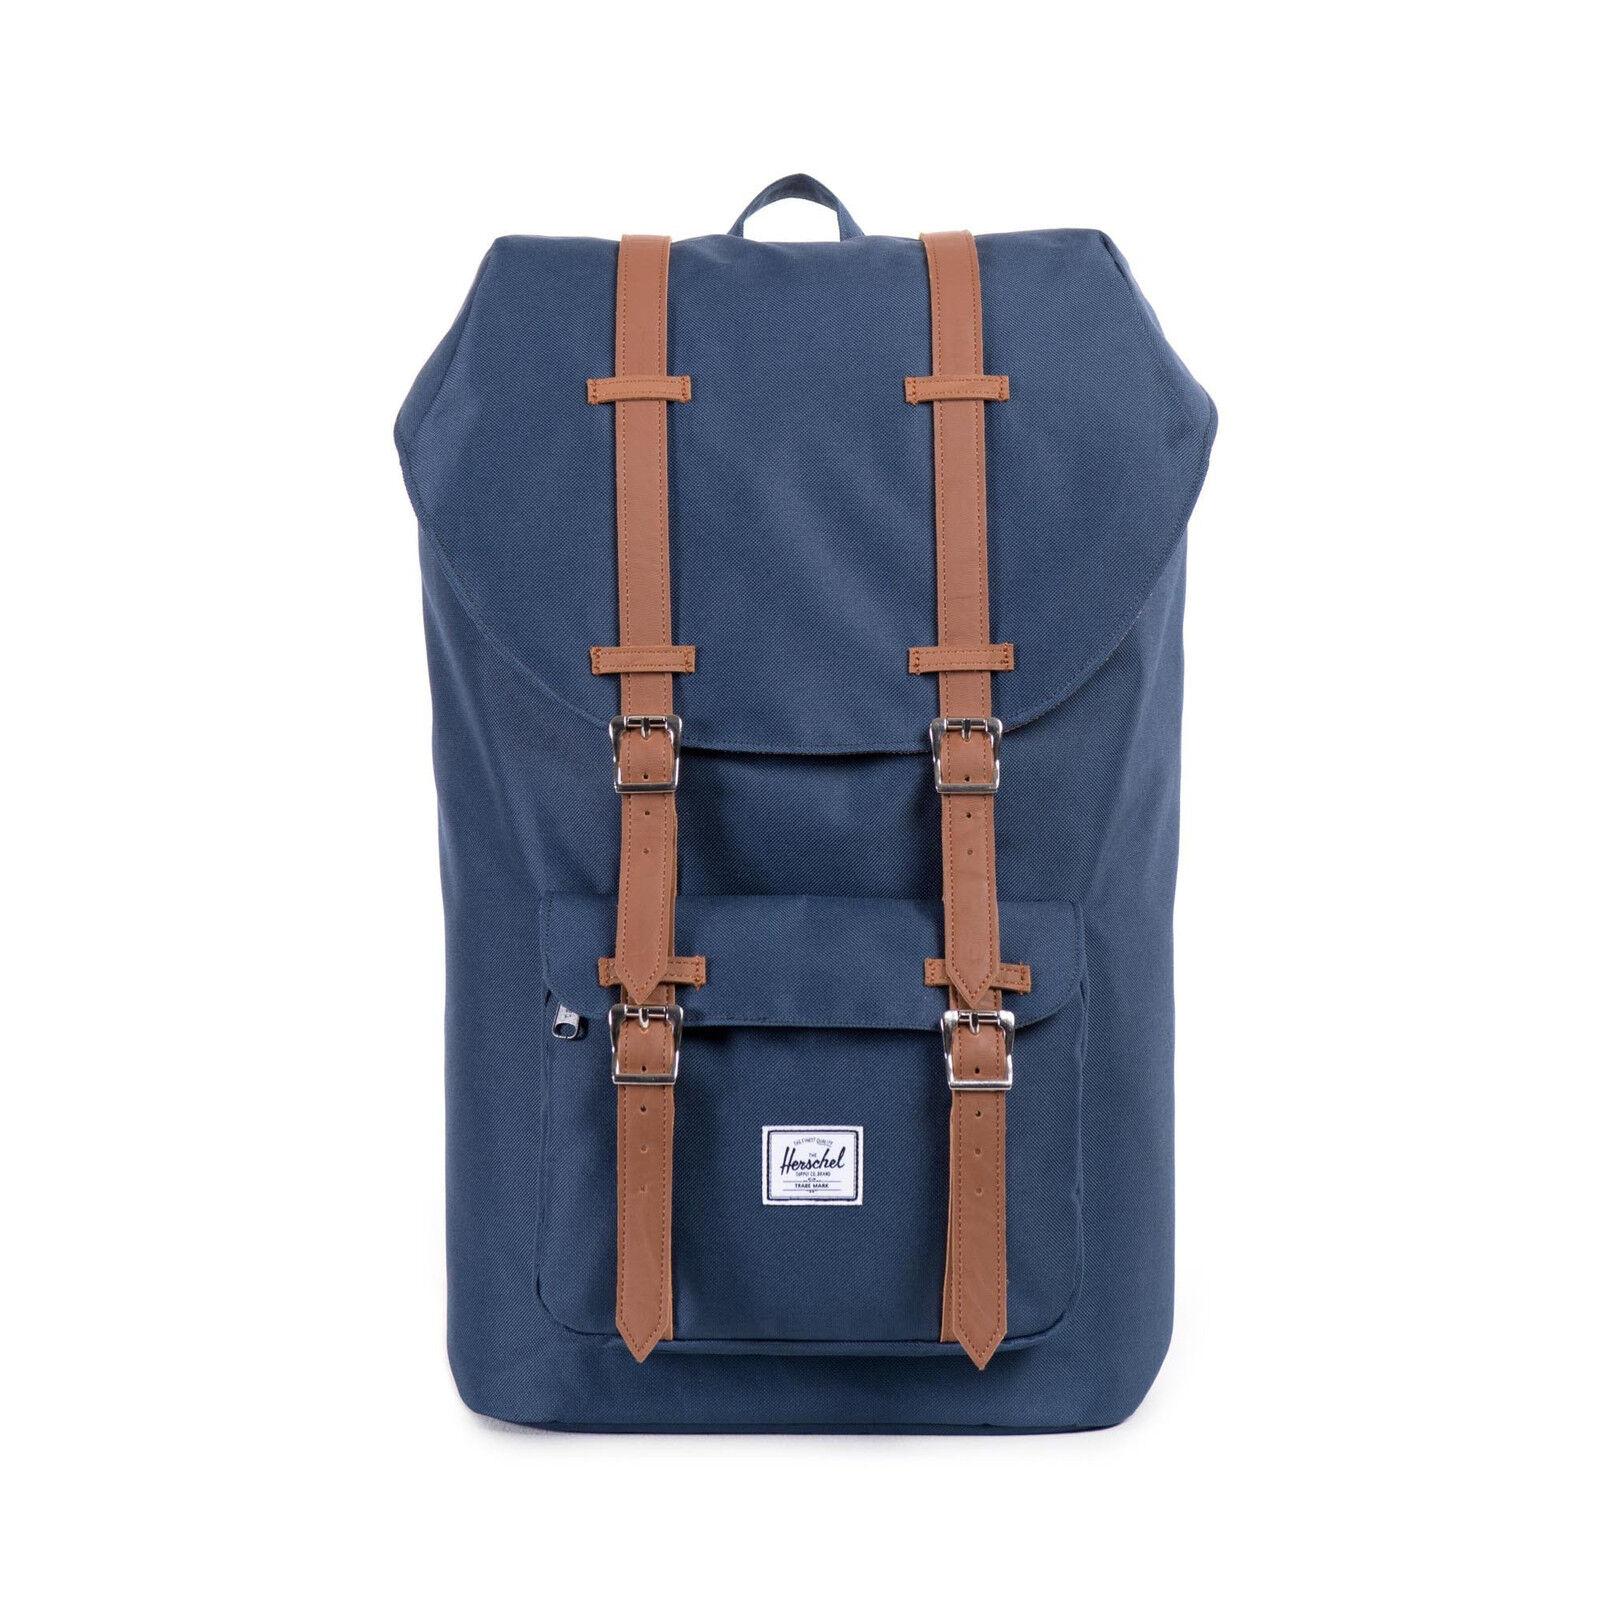 6de105d439ff Herschel Backpack Little America Classics Navy Ai17 One Size for ...